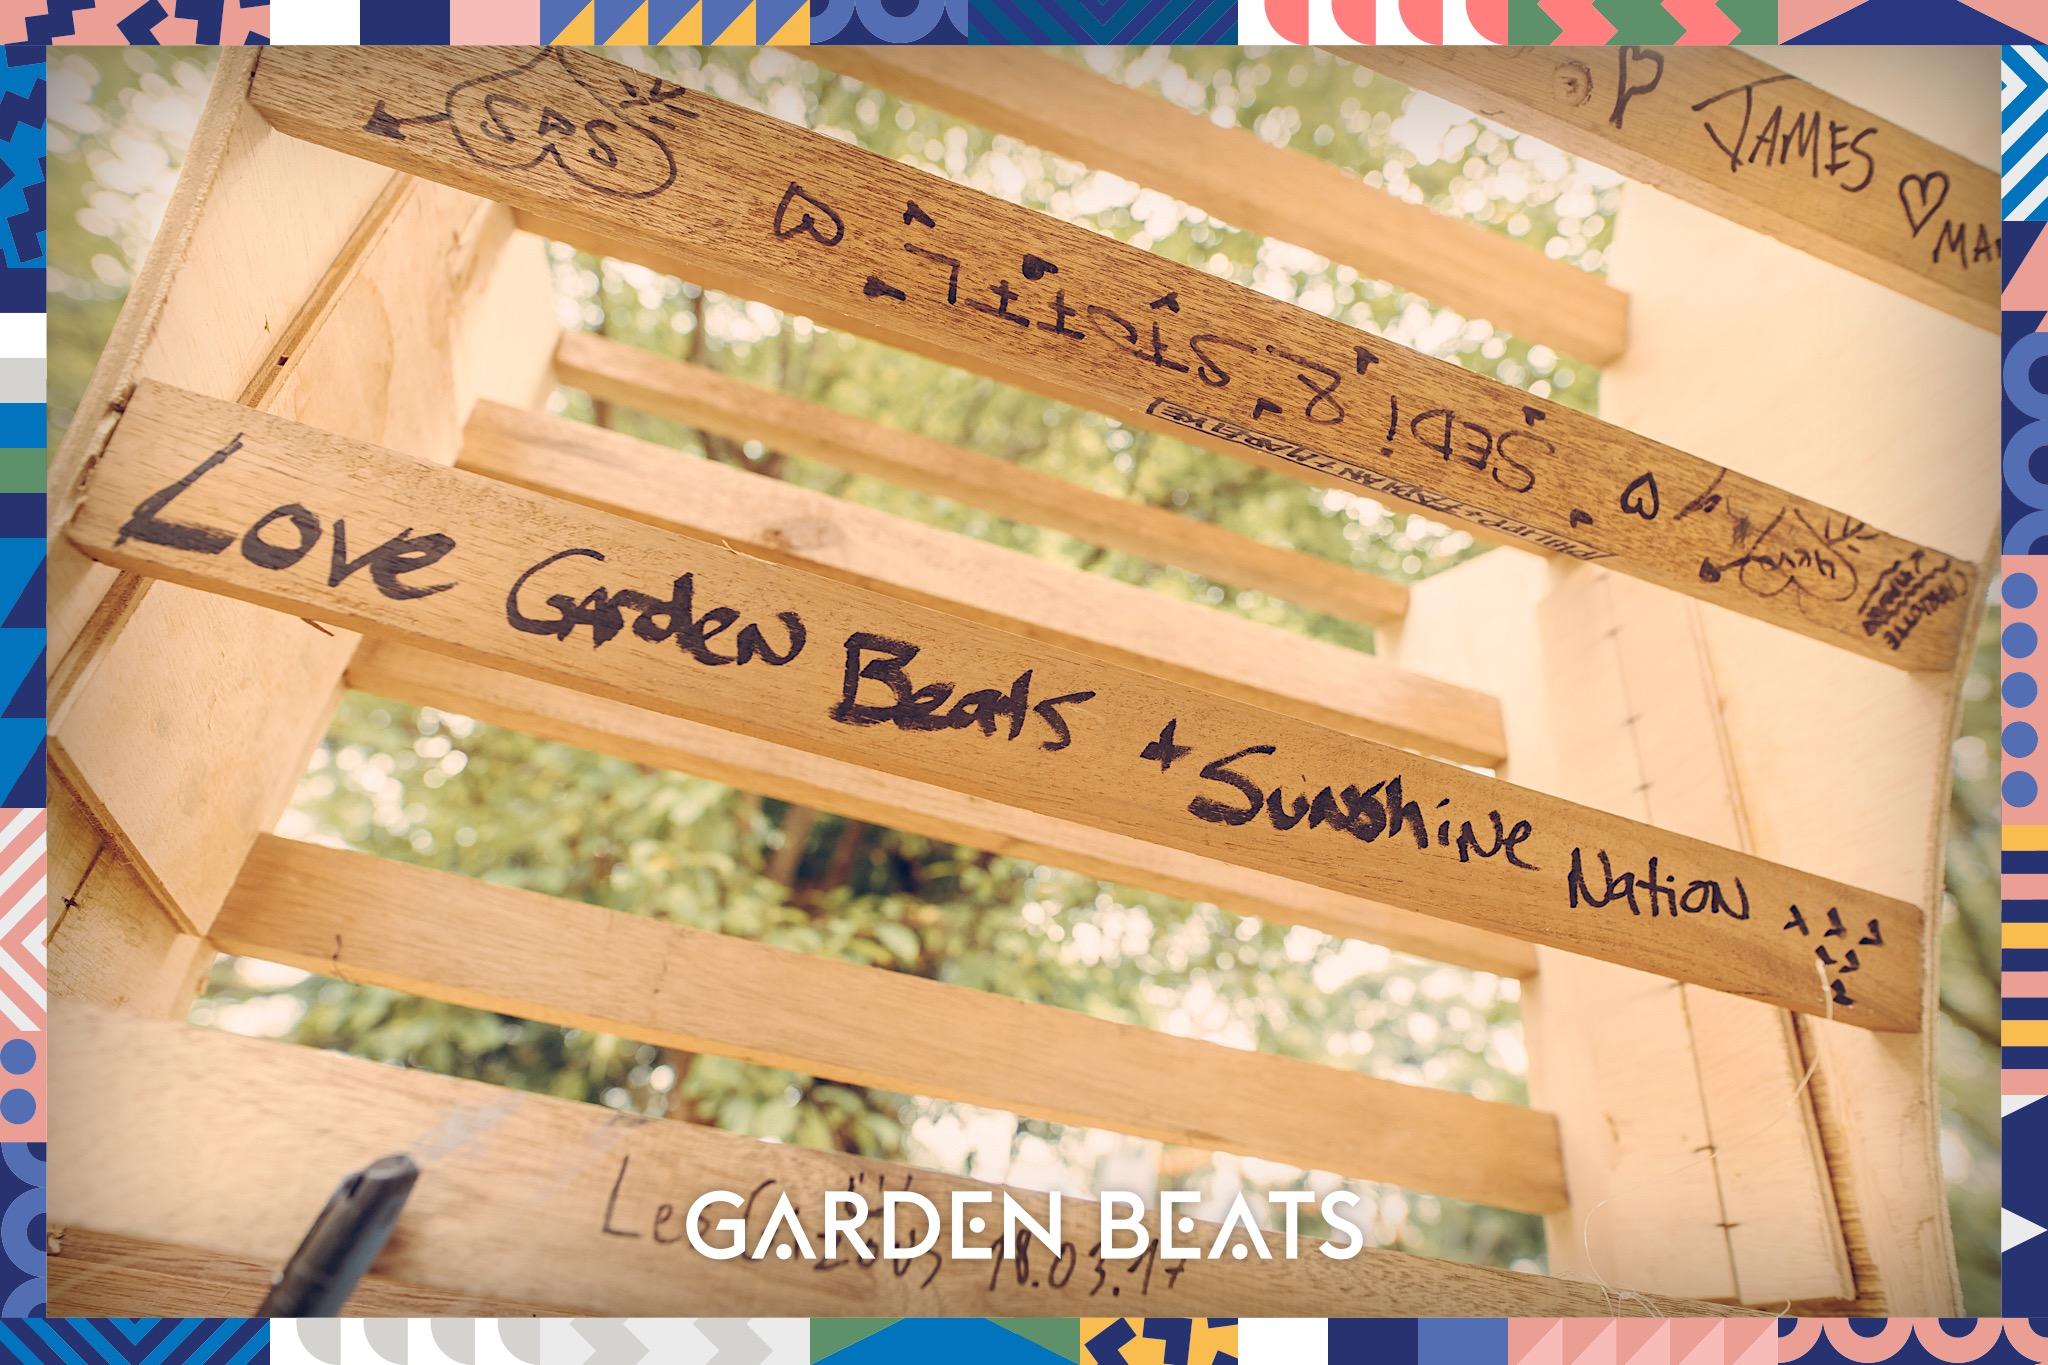 03032018_GardenBeats_Colossal079_Watermarked.jpg